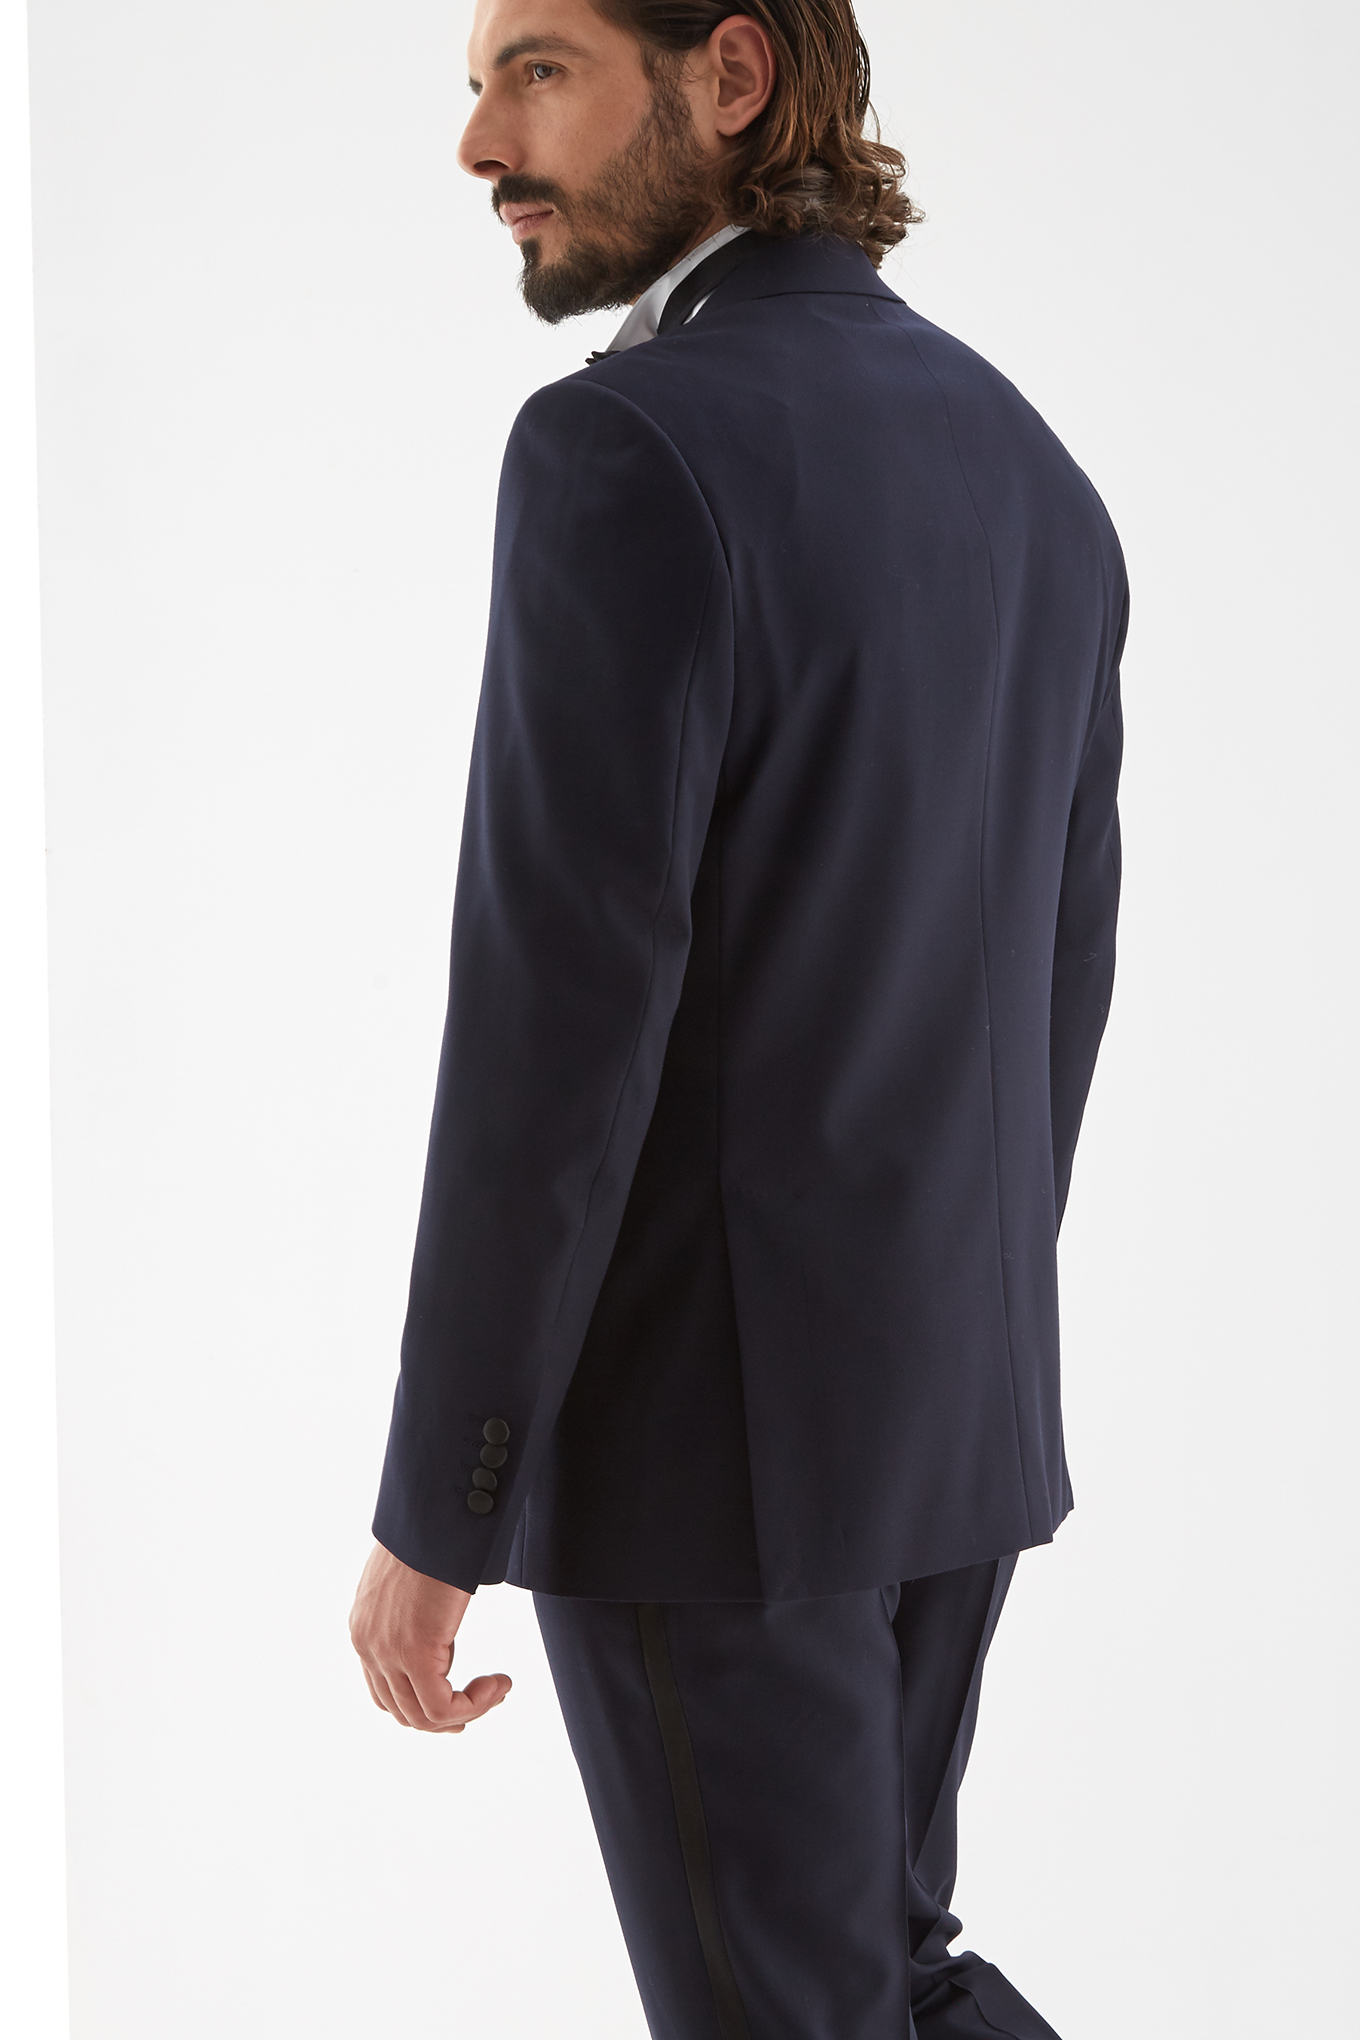 Tuxedo Azul Escuro Classic Homem